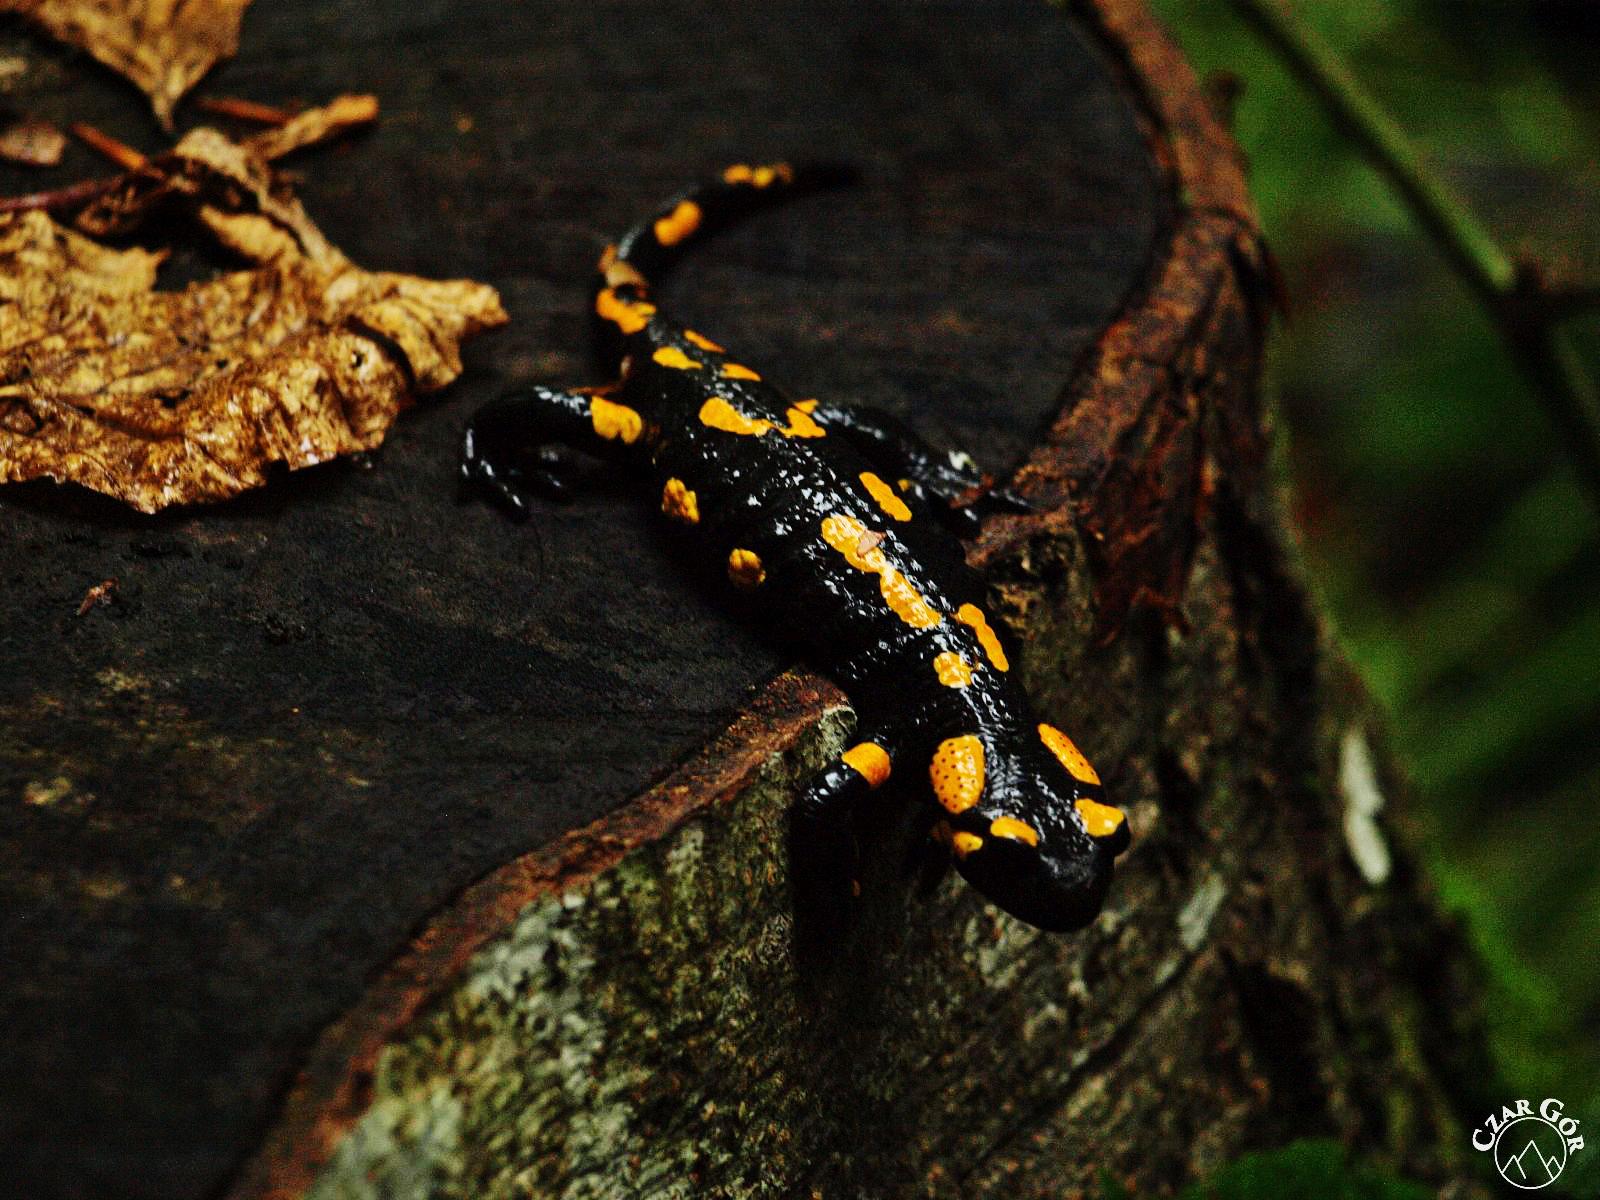 Salamandra Plamista